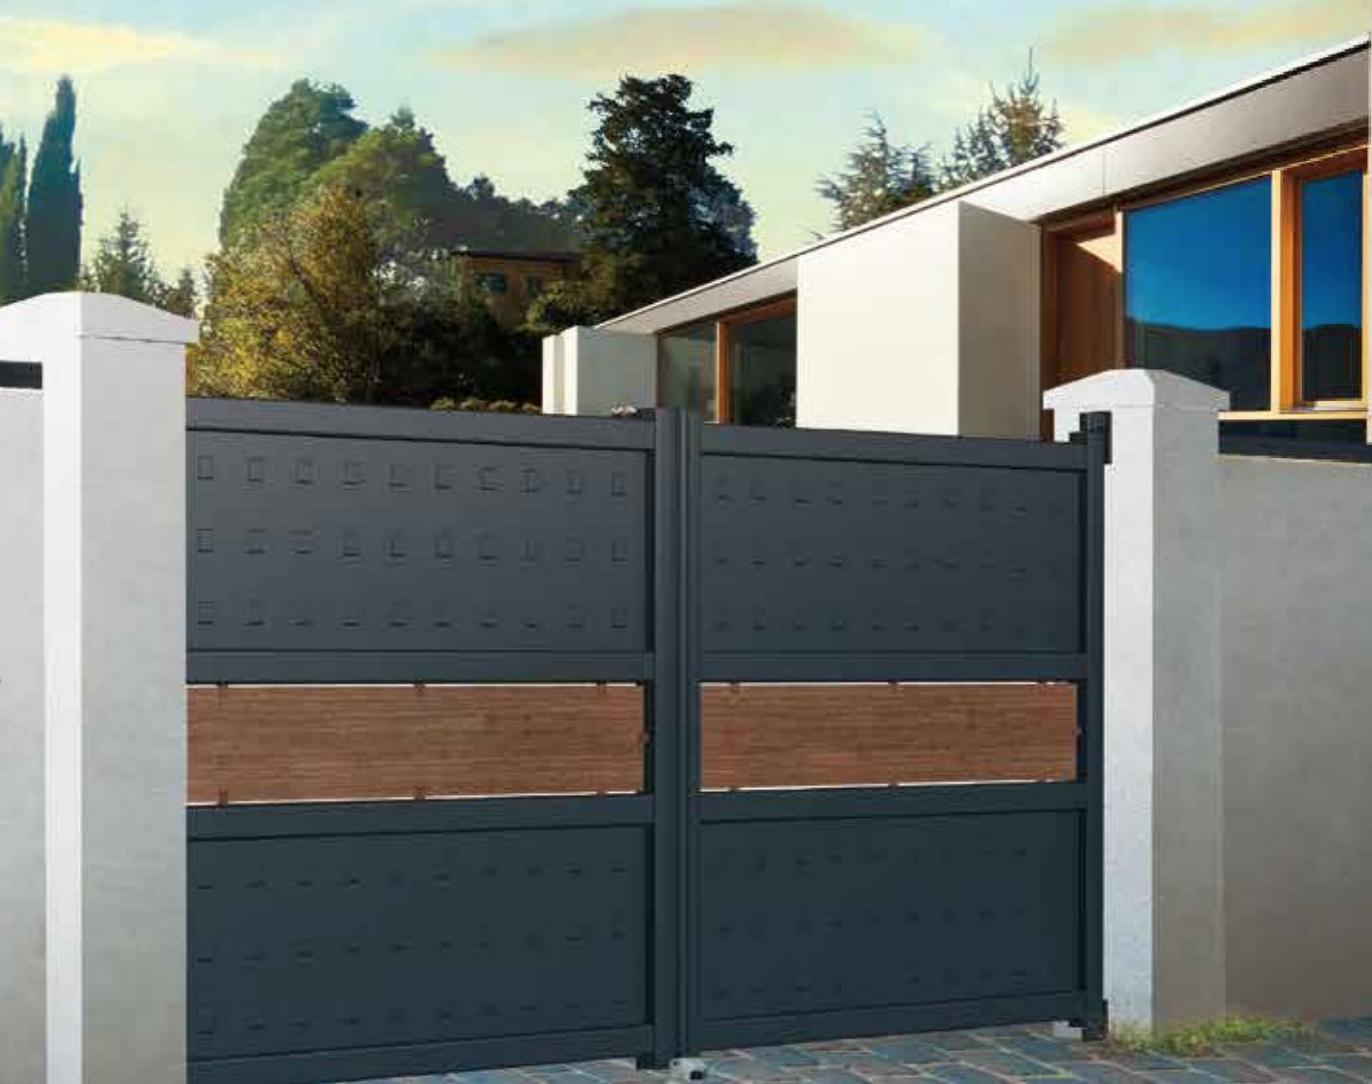 15 id es de portails battants modernes portail battant. Black Bedroom Furniture Sets. Home Design Ideas